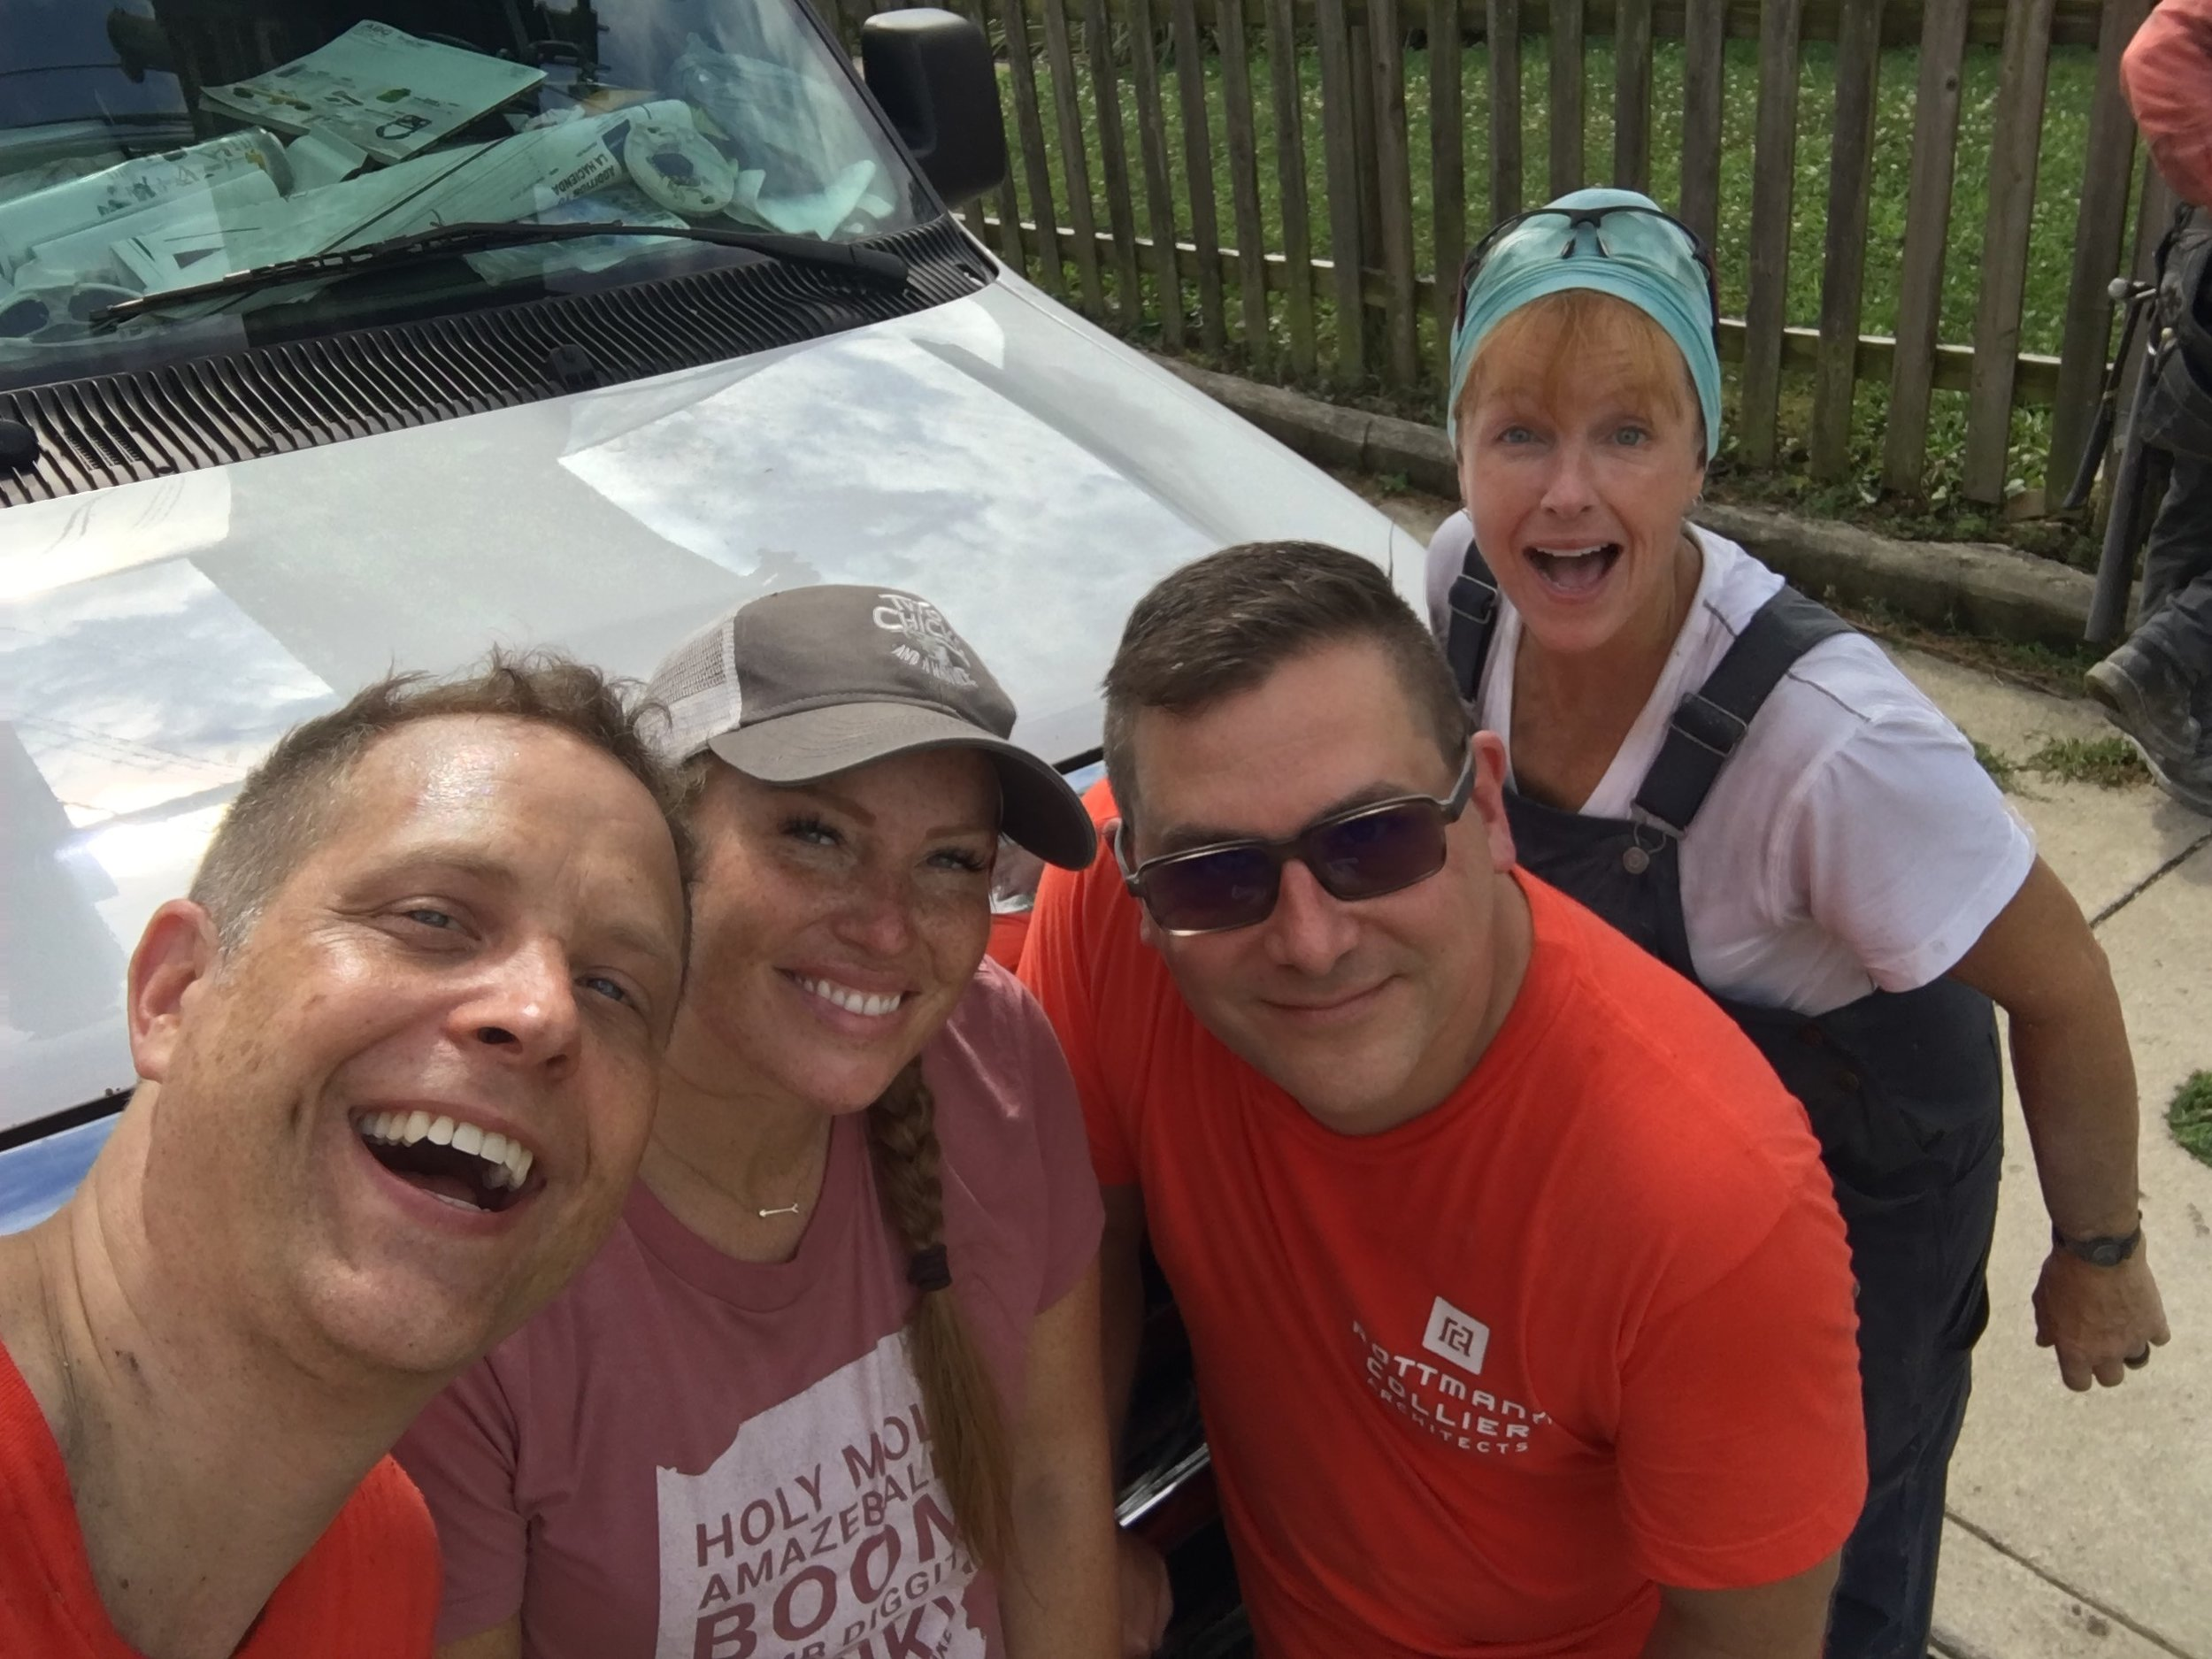 Todd, Mina, Rod, and Karen on demolition day for HGTV's Good Bones